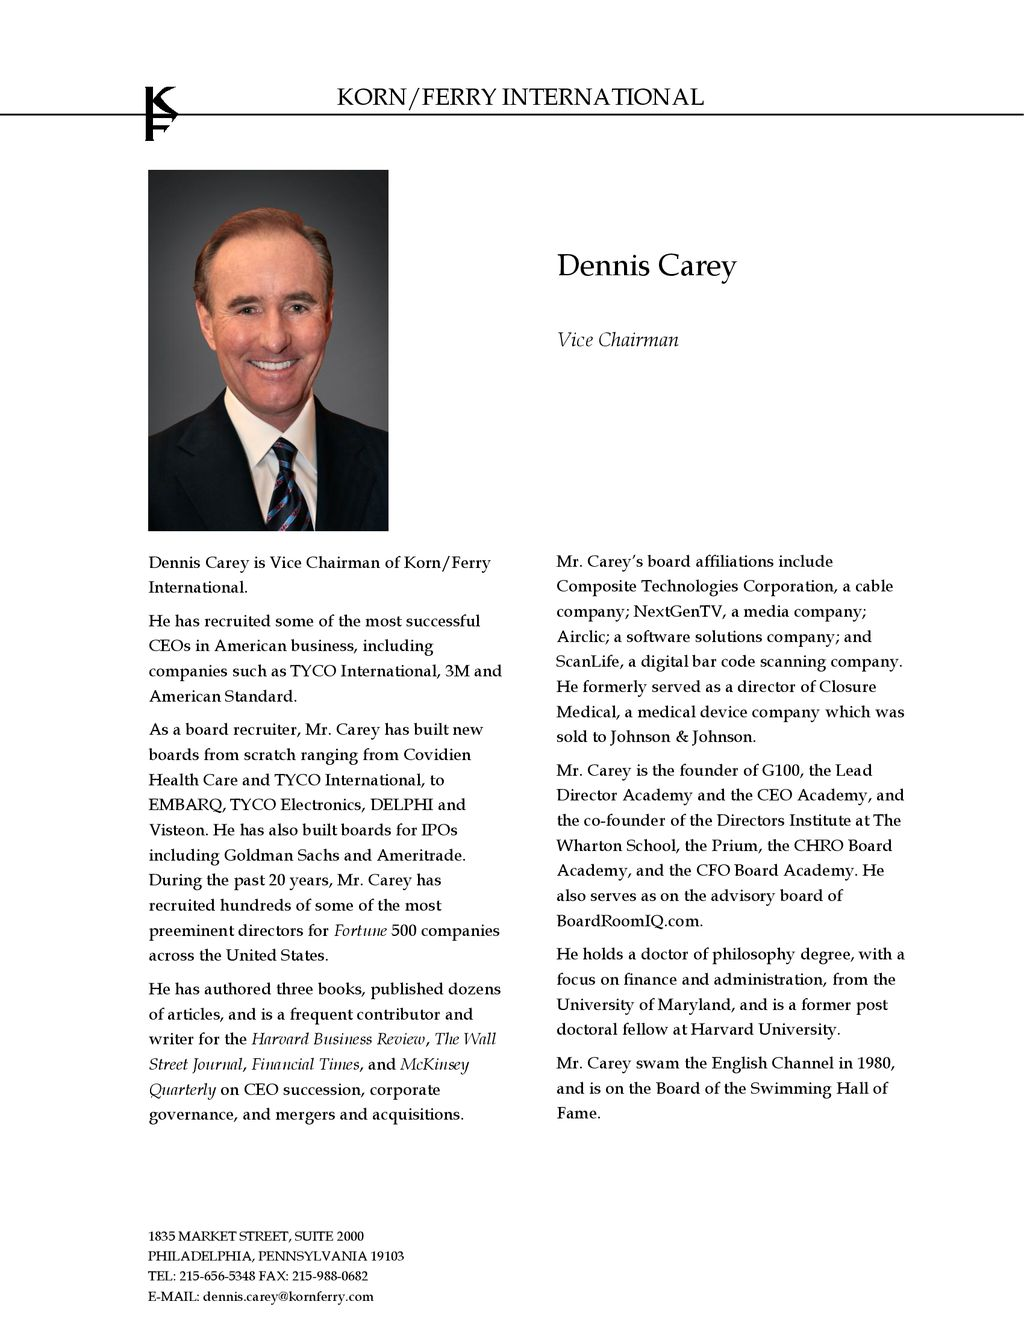 Dennis Carey Vice Chairman